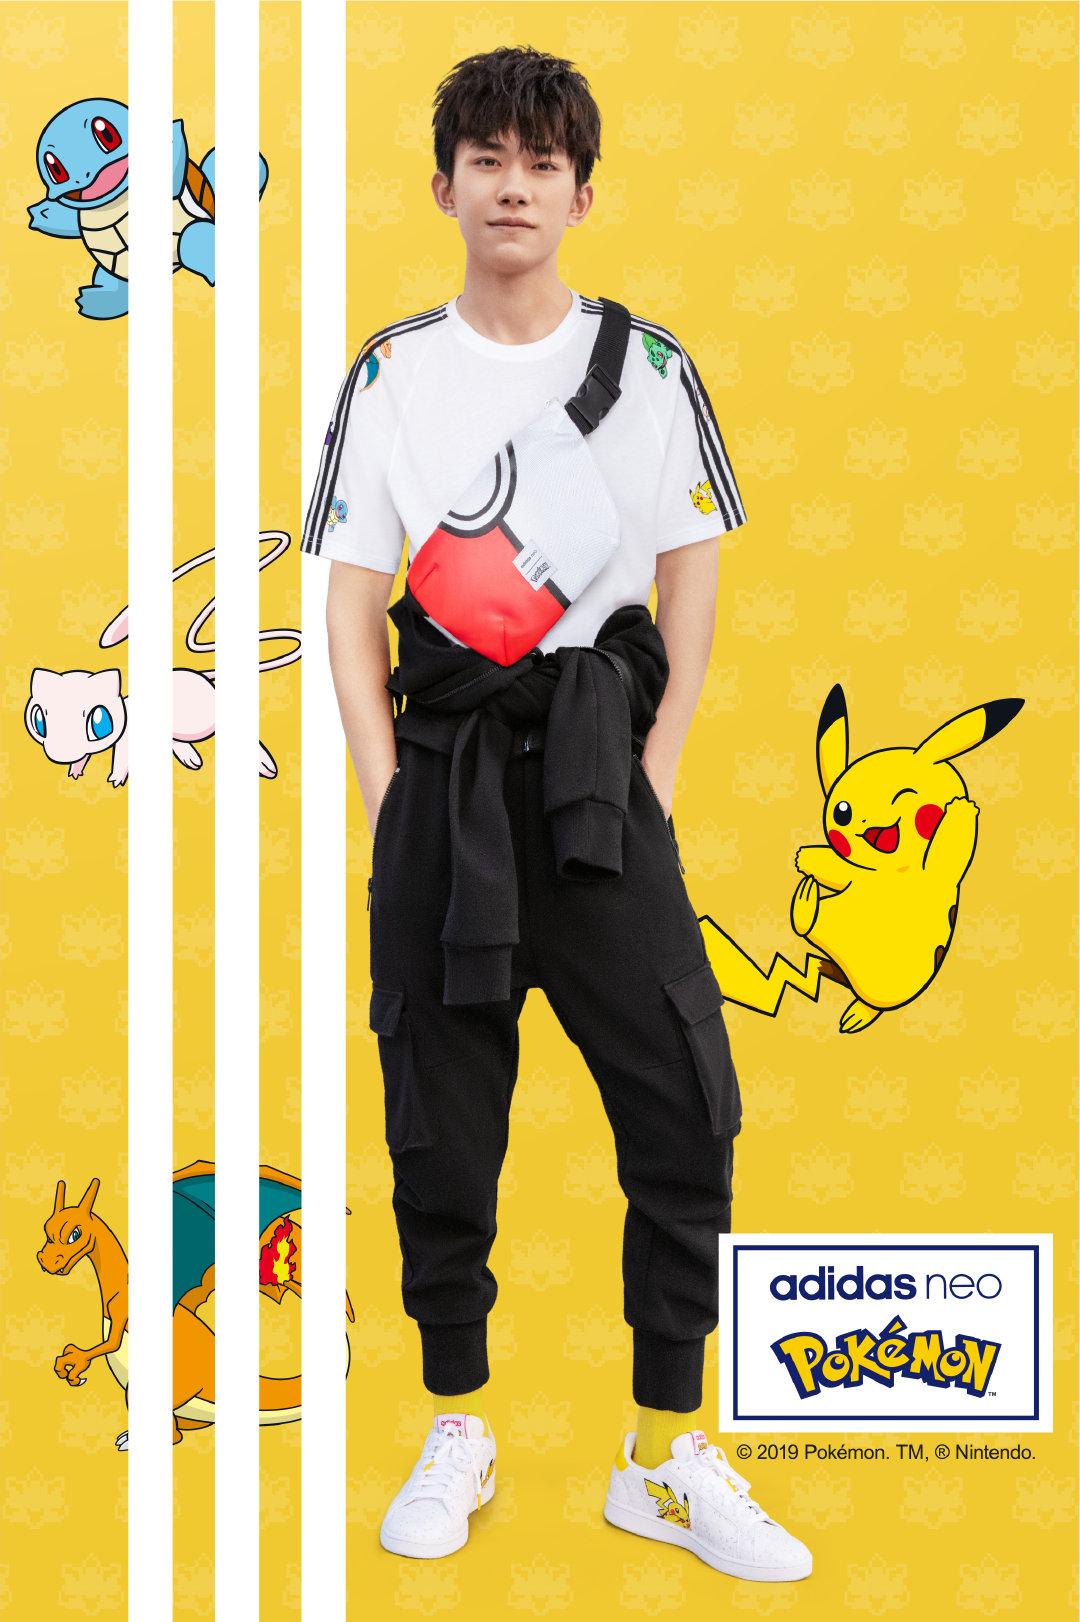 【adidas neo×宝可梦】跨界联名款明日开启预购